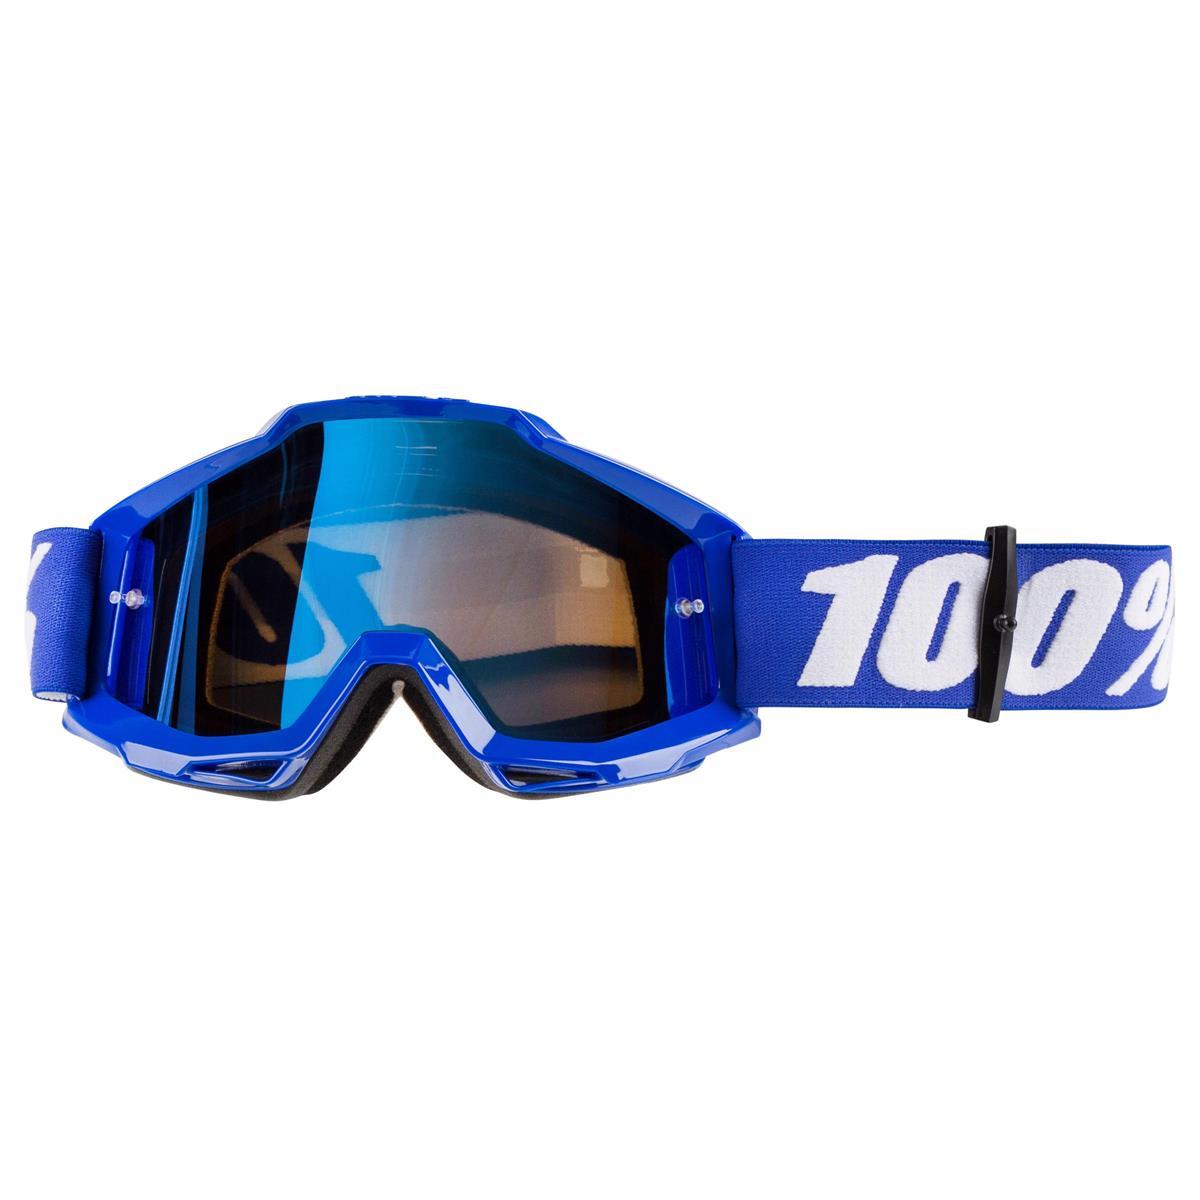 100% Crossbrille The Accuri Reflex Blue - Blau verspiegelt Anti-Fog